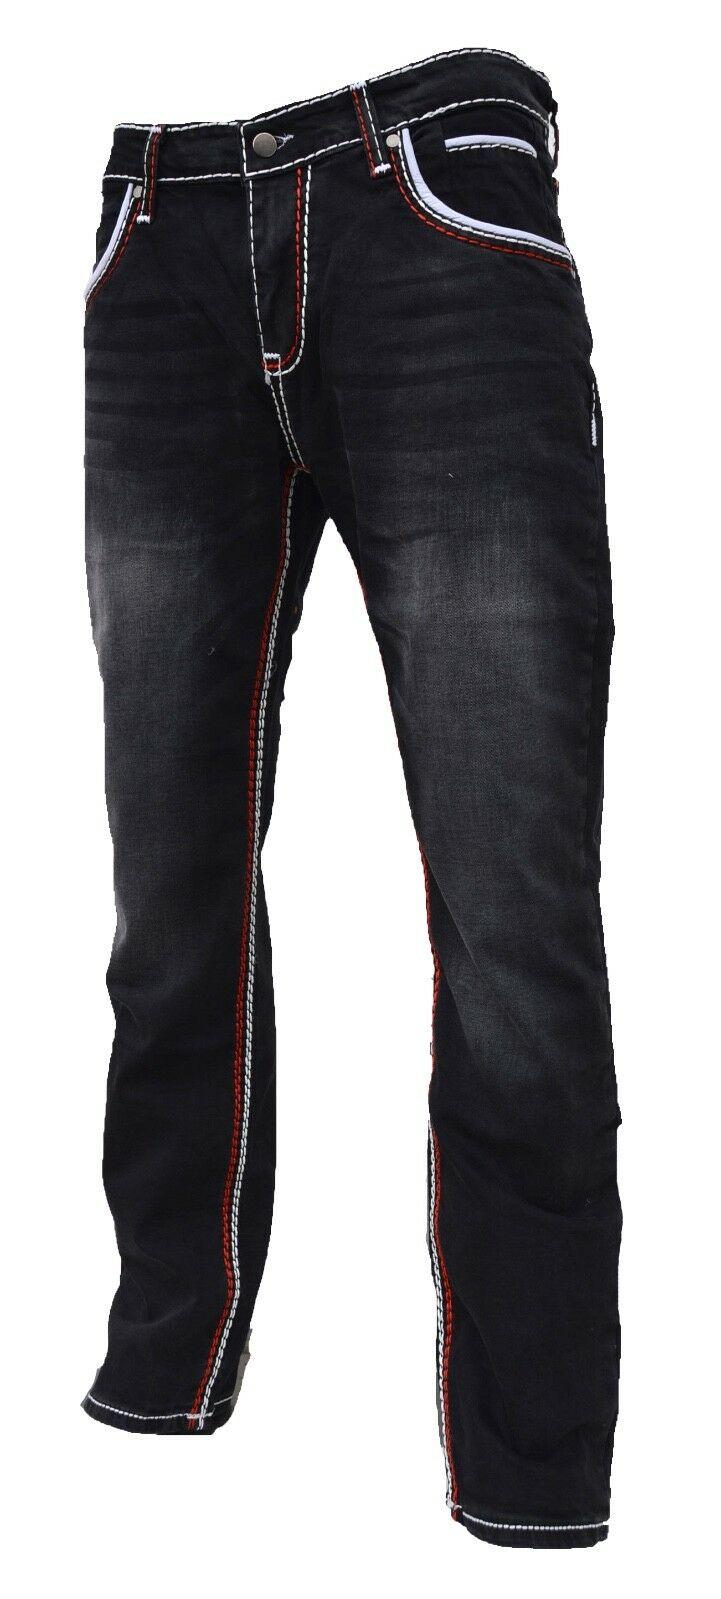 Herren-Jeans-Hose-Denim-KC-Black-Washed-Straight-Cut-Regular-Dicke-Naht-naehte Indexbild 18